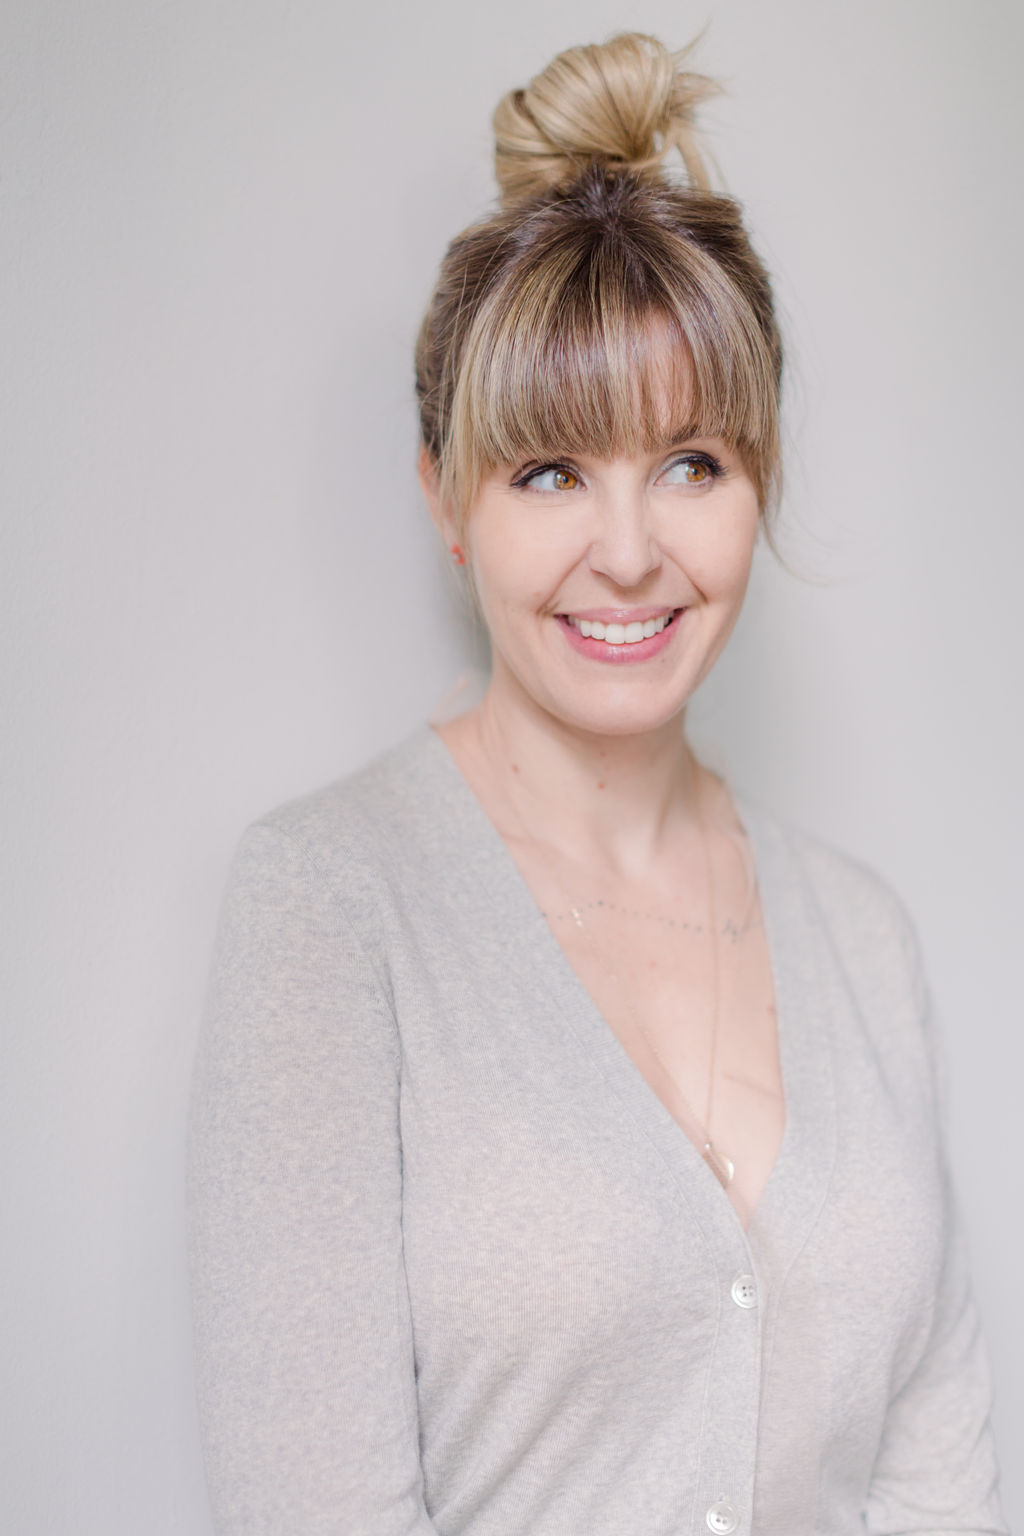 Vanessa Sicotte